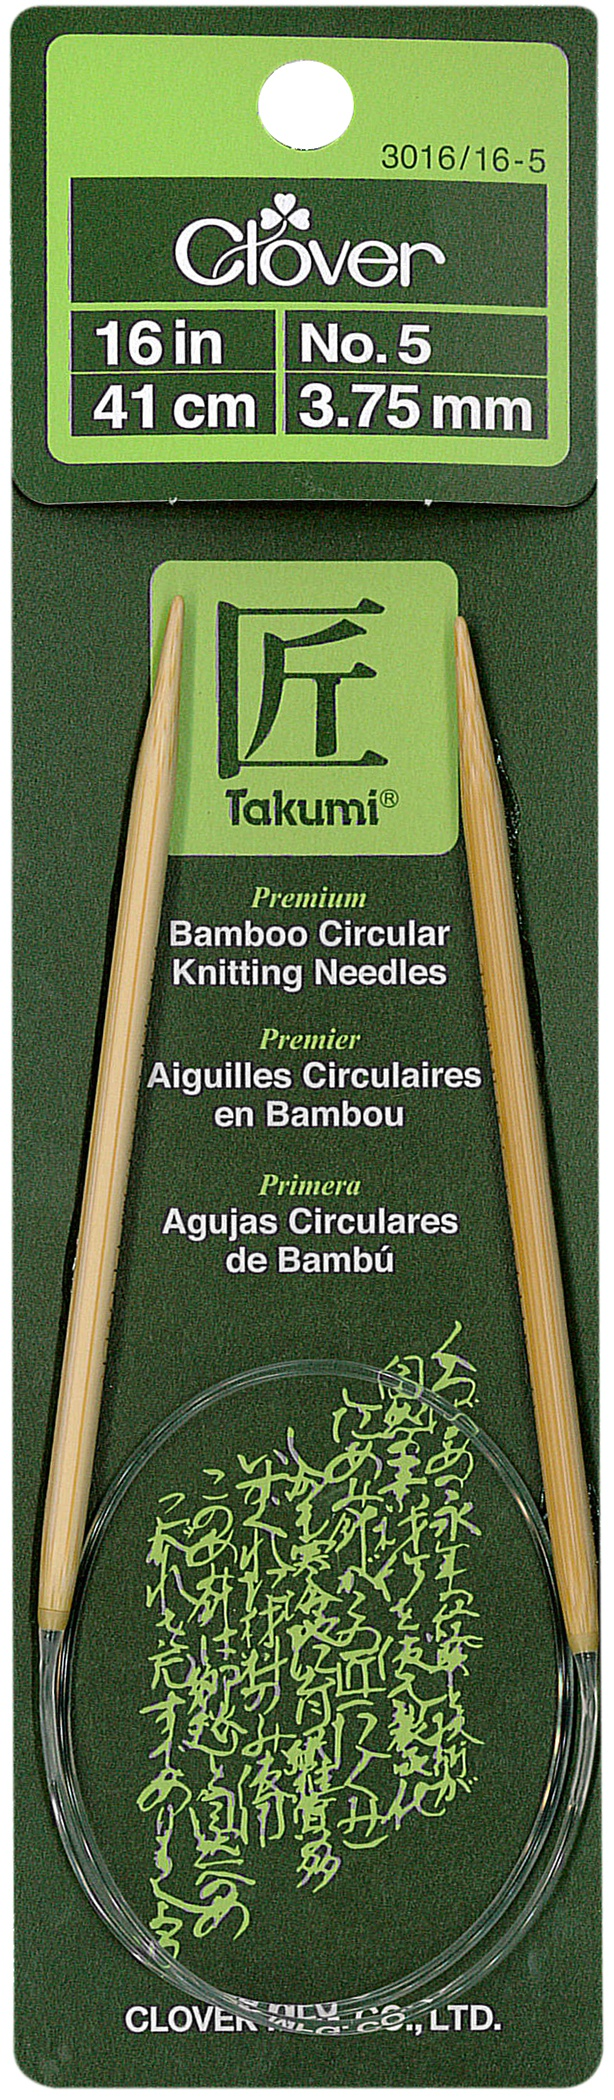 Takumi Bamboo Circular Knitting Needles 16-Size 5/3.75mm